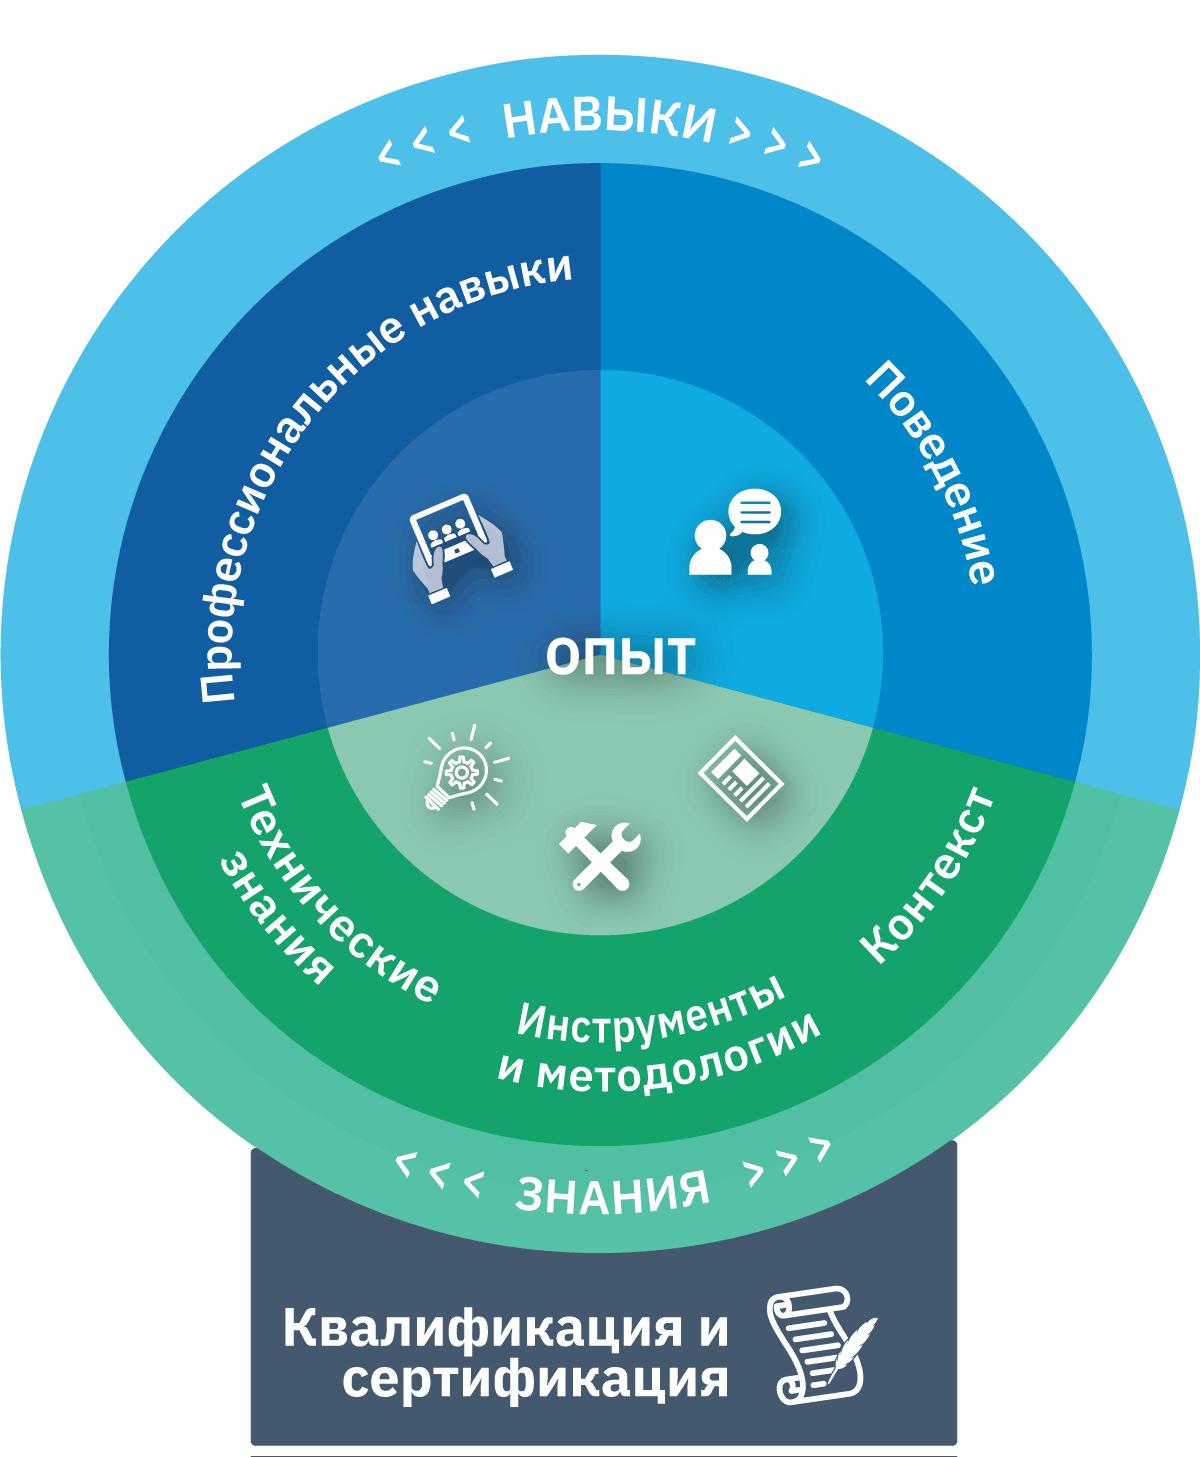 Keyhole diagram